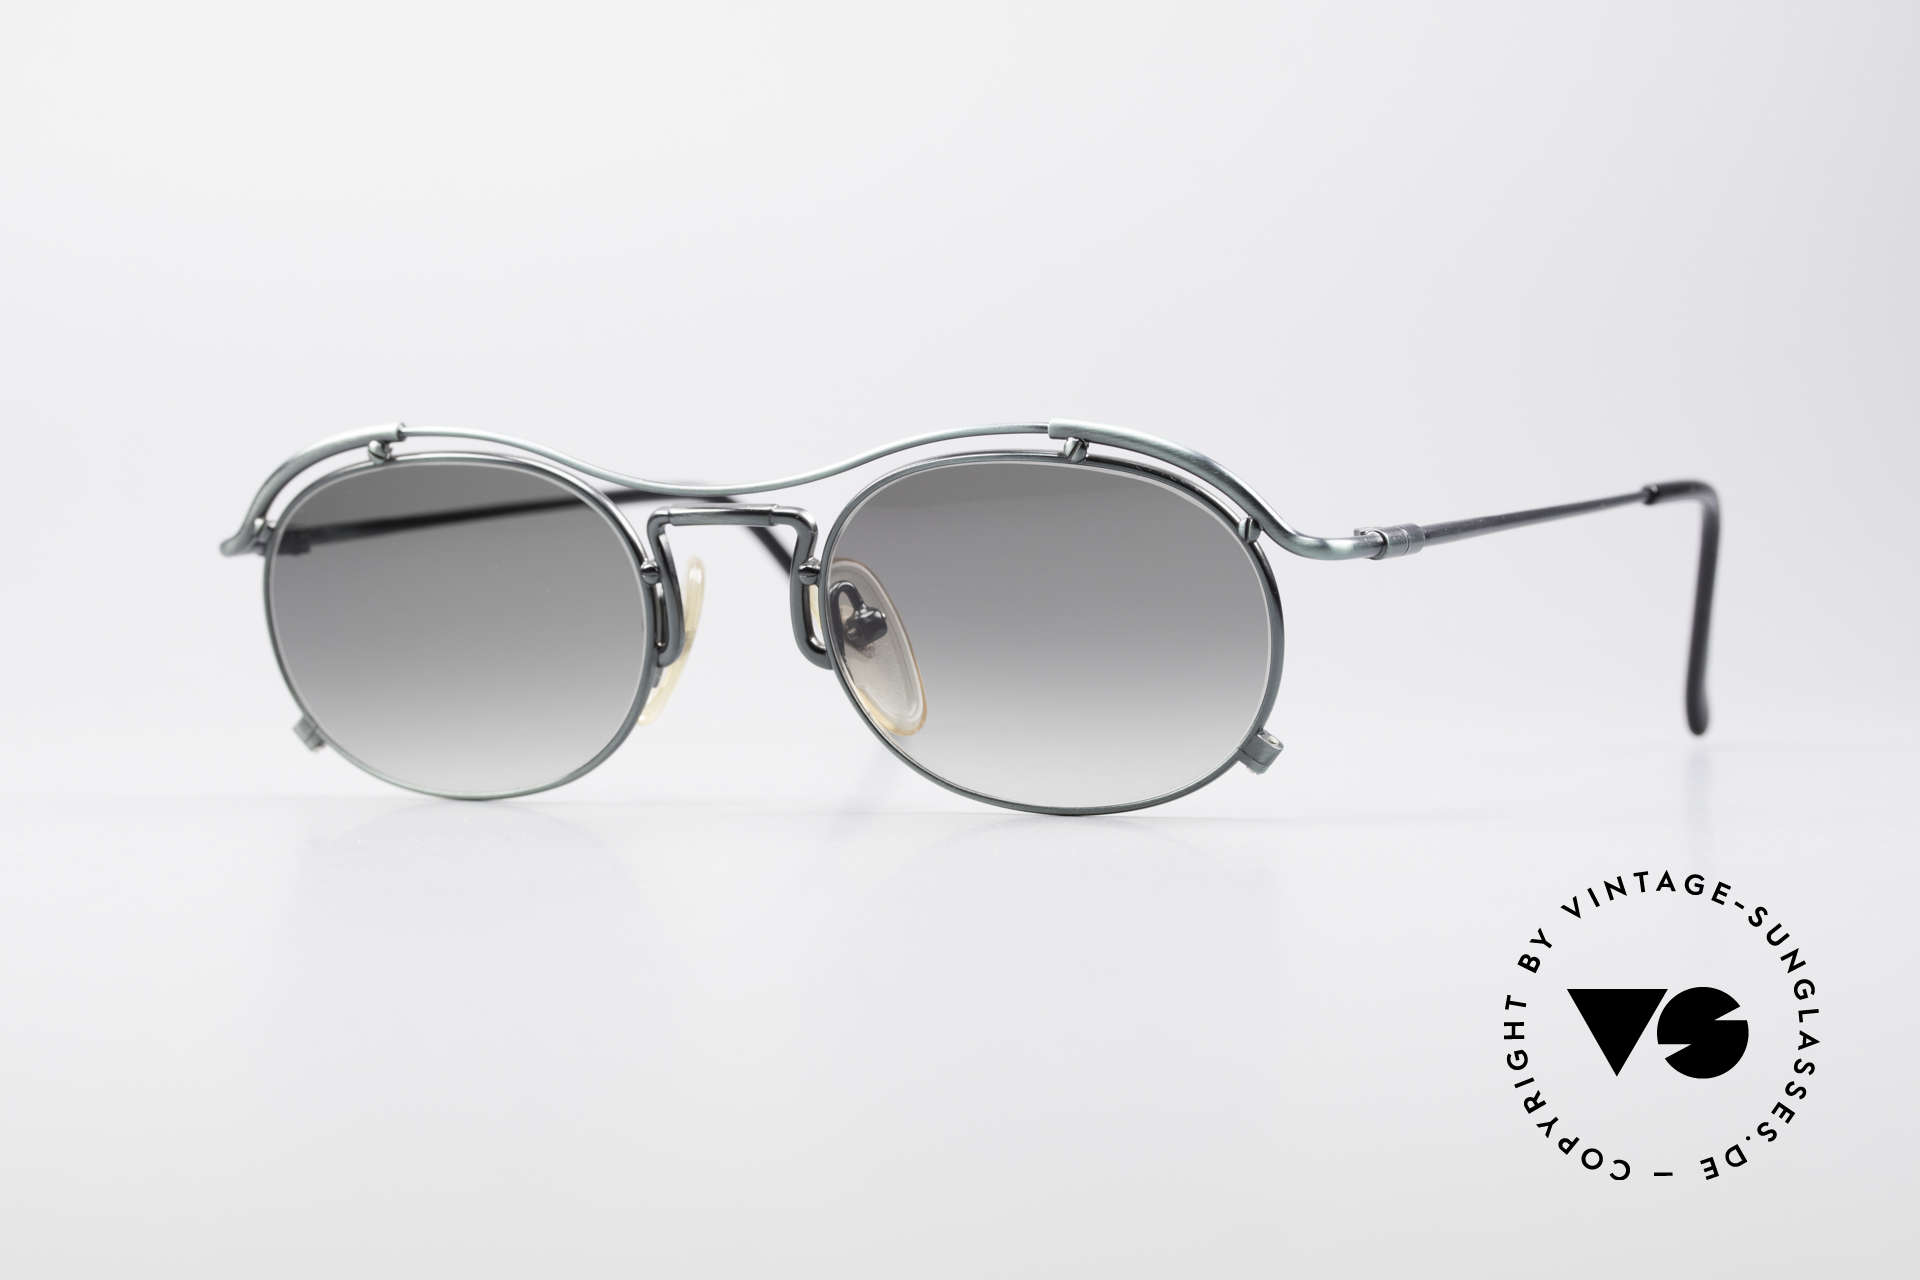 Jean Paul Gaultier 55-2170 Vintage 90's Sunglasses, true vintage Jean Paul GAULTIER designer shades, Made for Men and Women